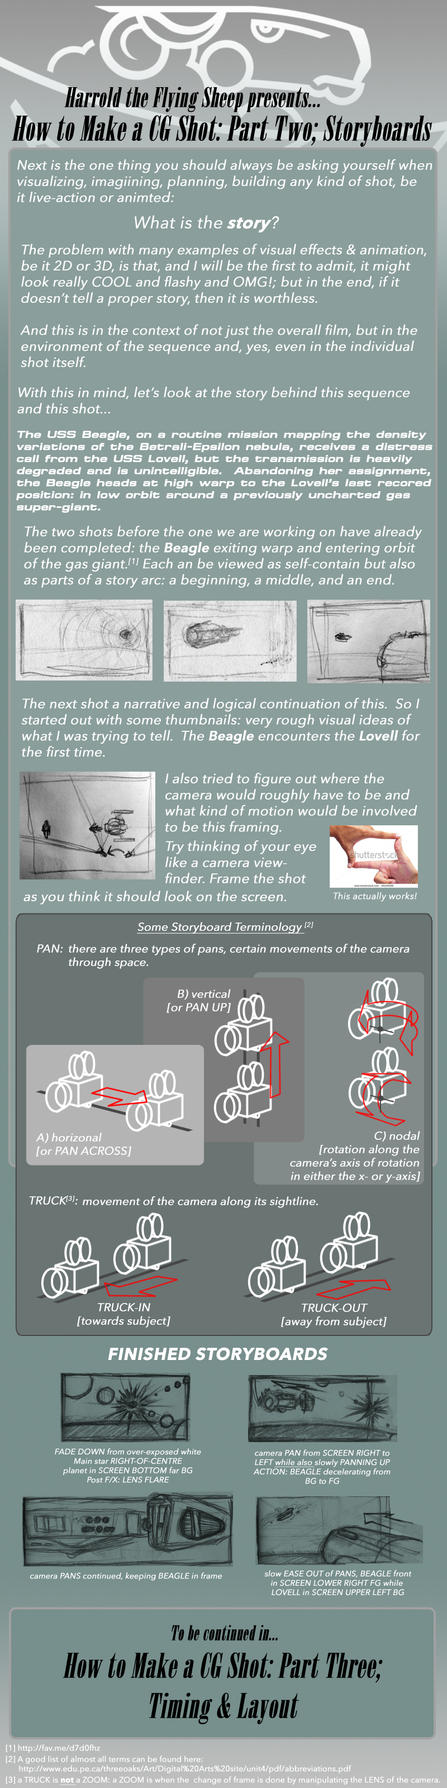 How to Make a CG Shot: Part 2, the Storyboard by harroldsheep